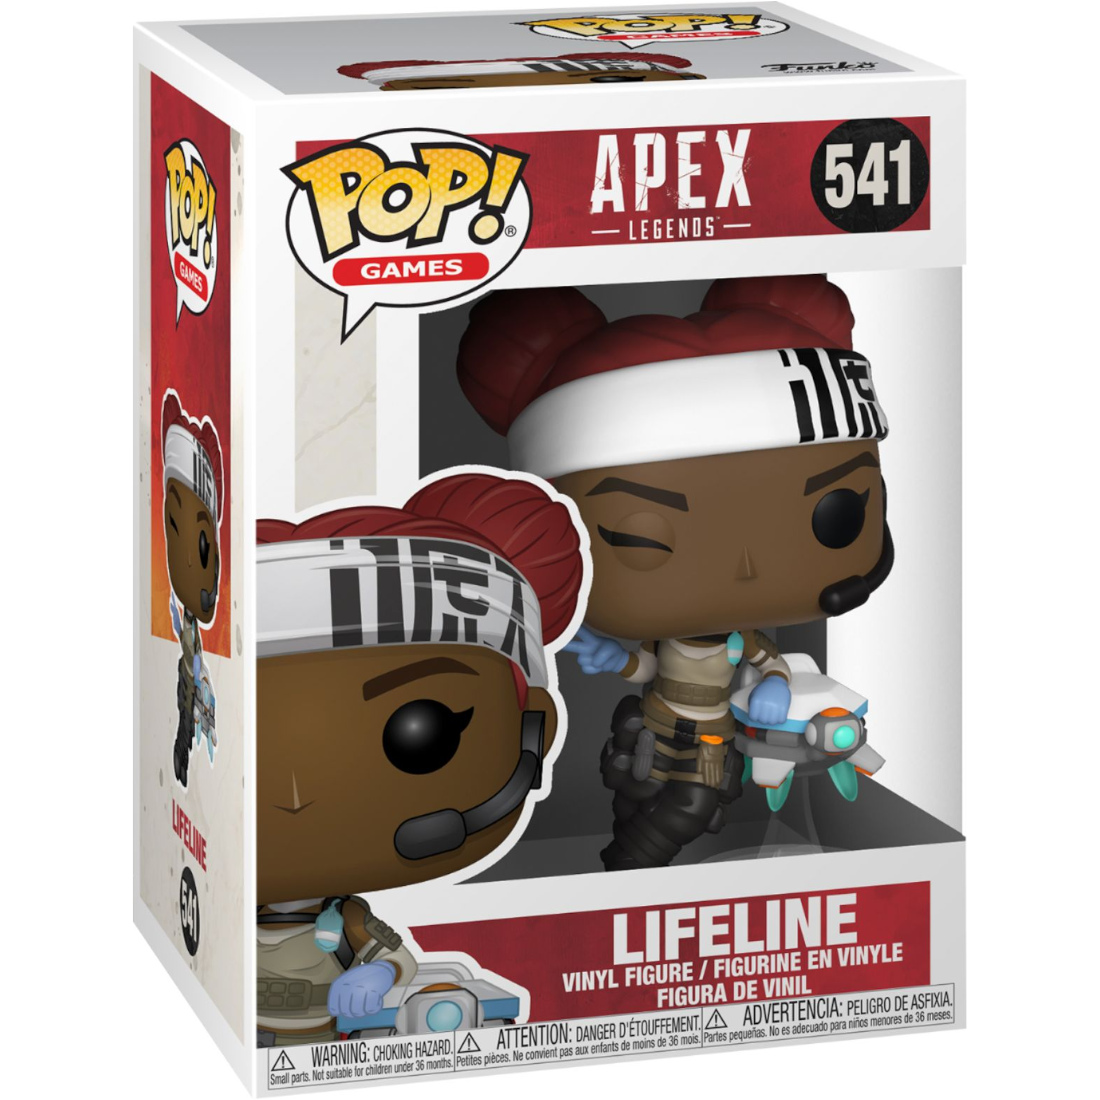 Funko Pop! Games Apex Legends 541 Lifeline